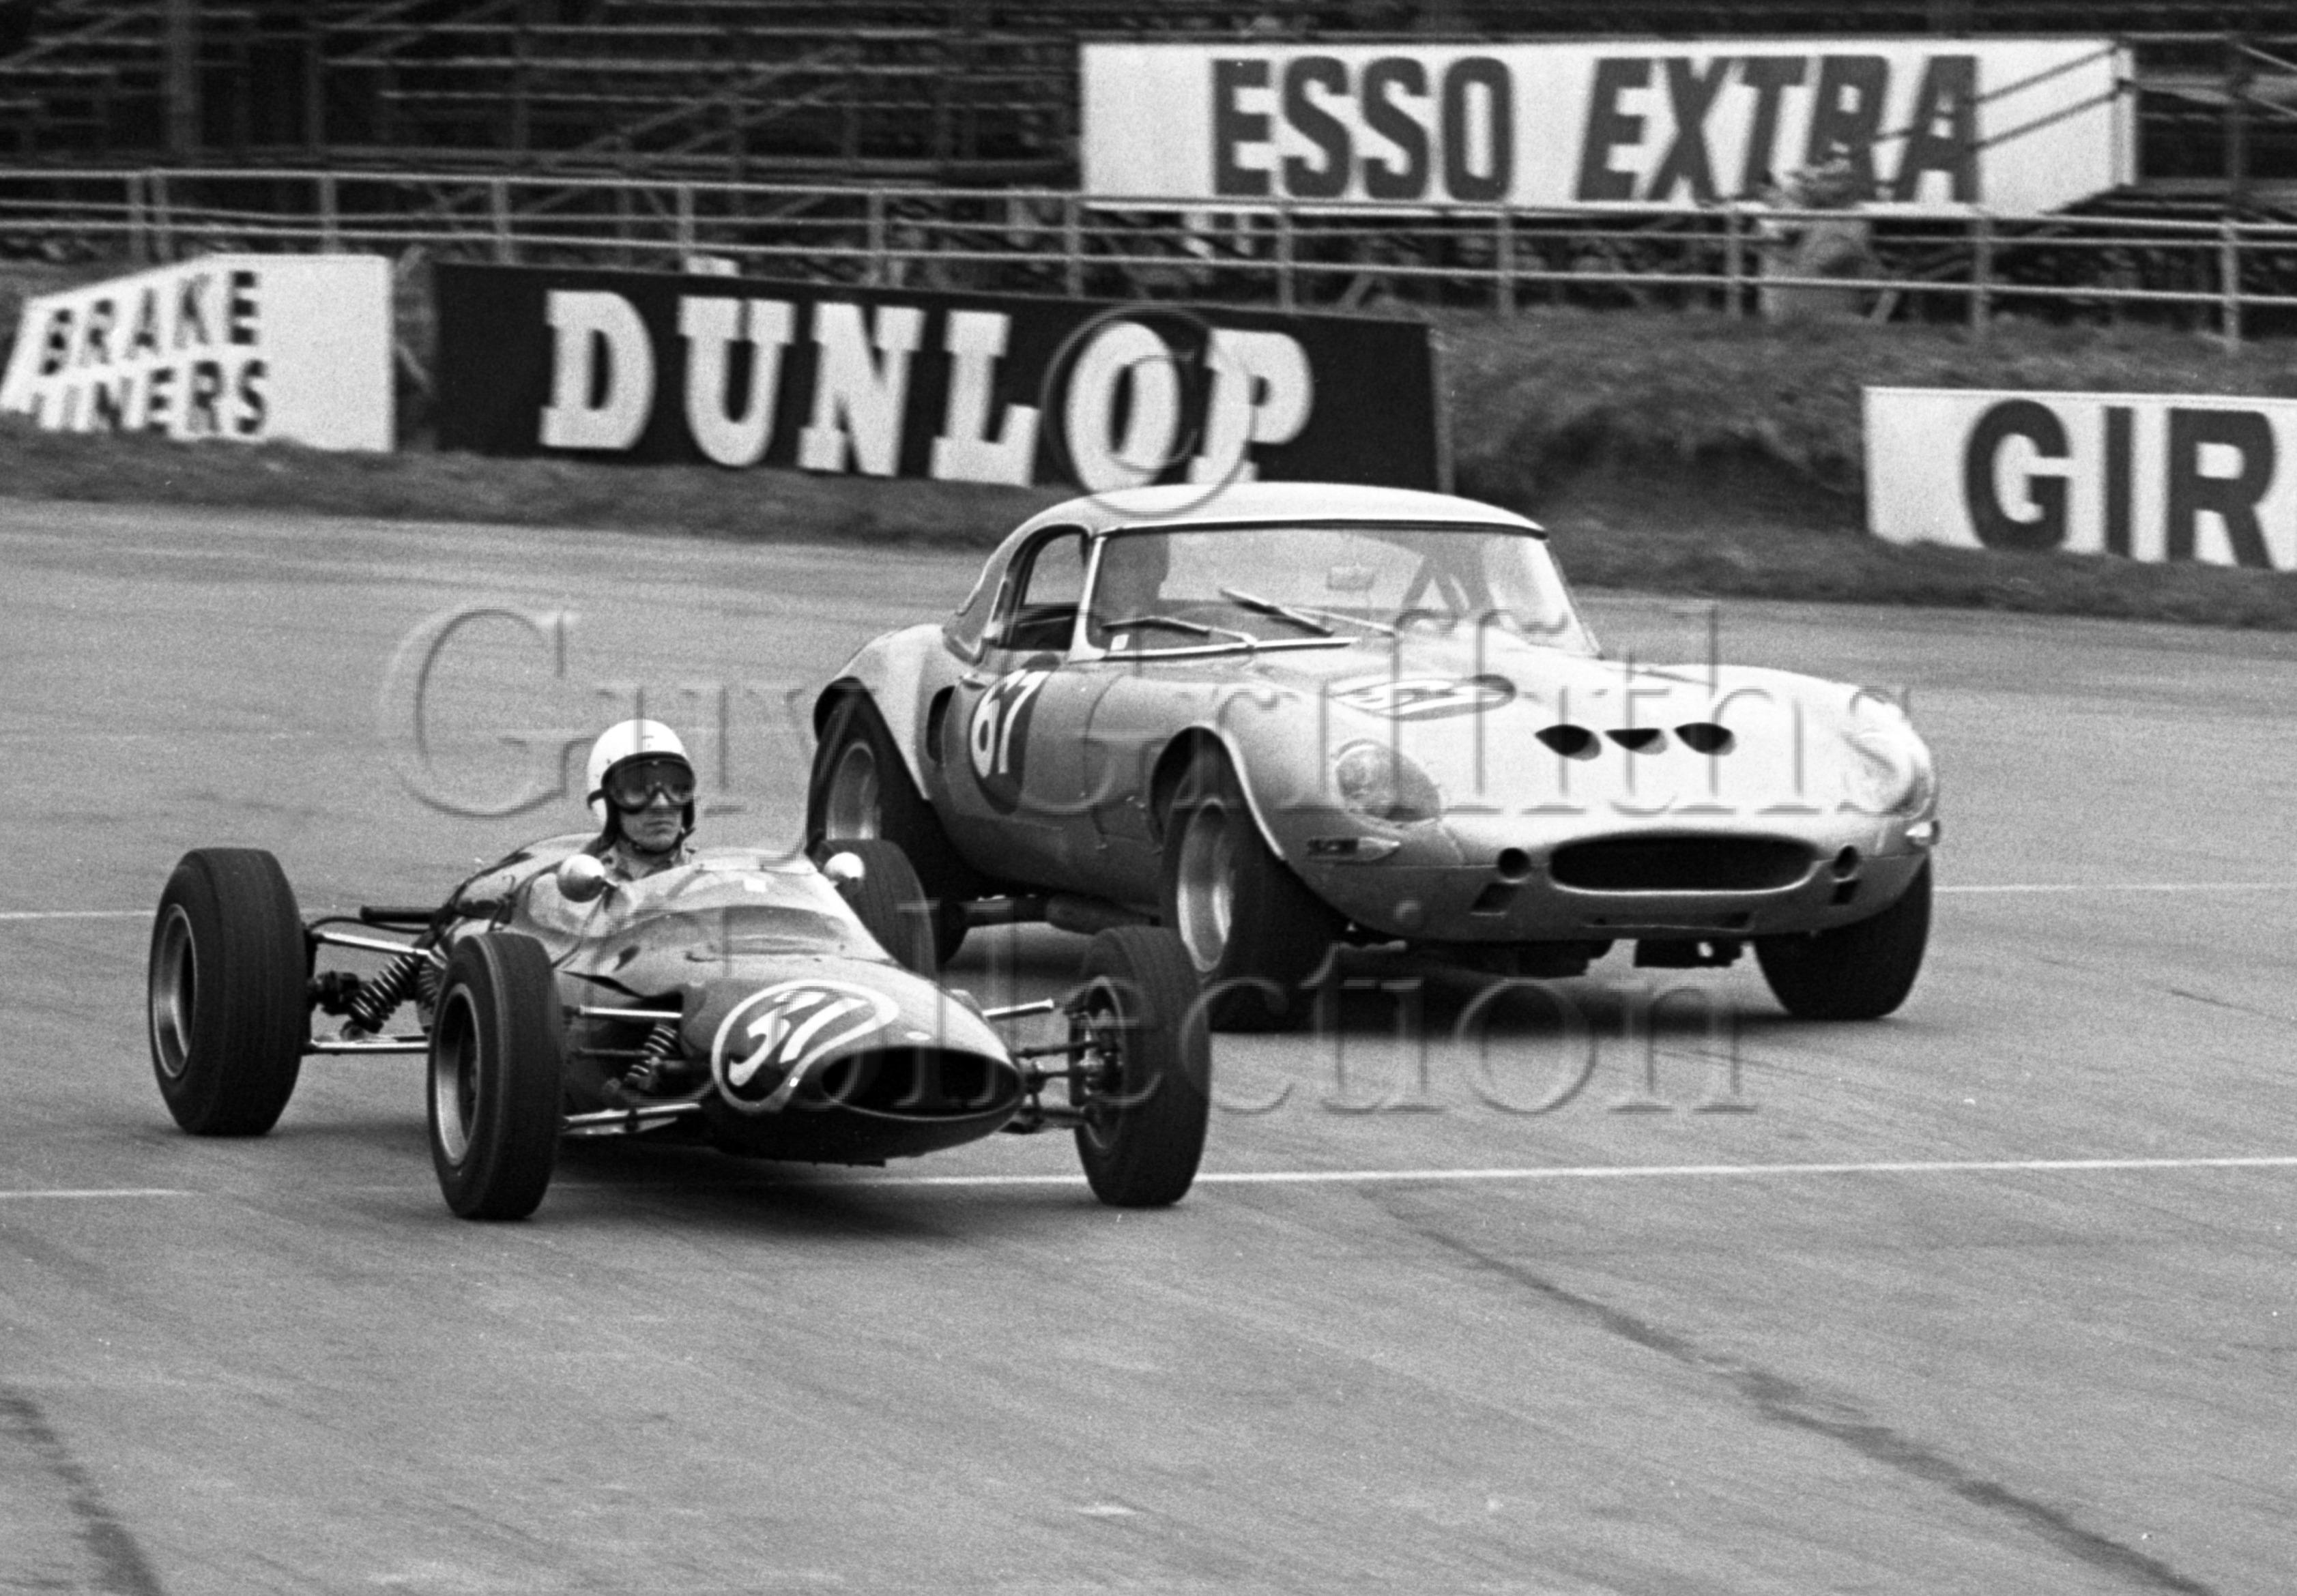 107-572–G-Richardson–Jaguar-Egal-590-DXR–Silverstone–30-03-1968.jpg - Guy Griffiths Collection